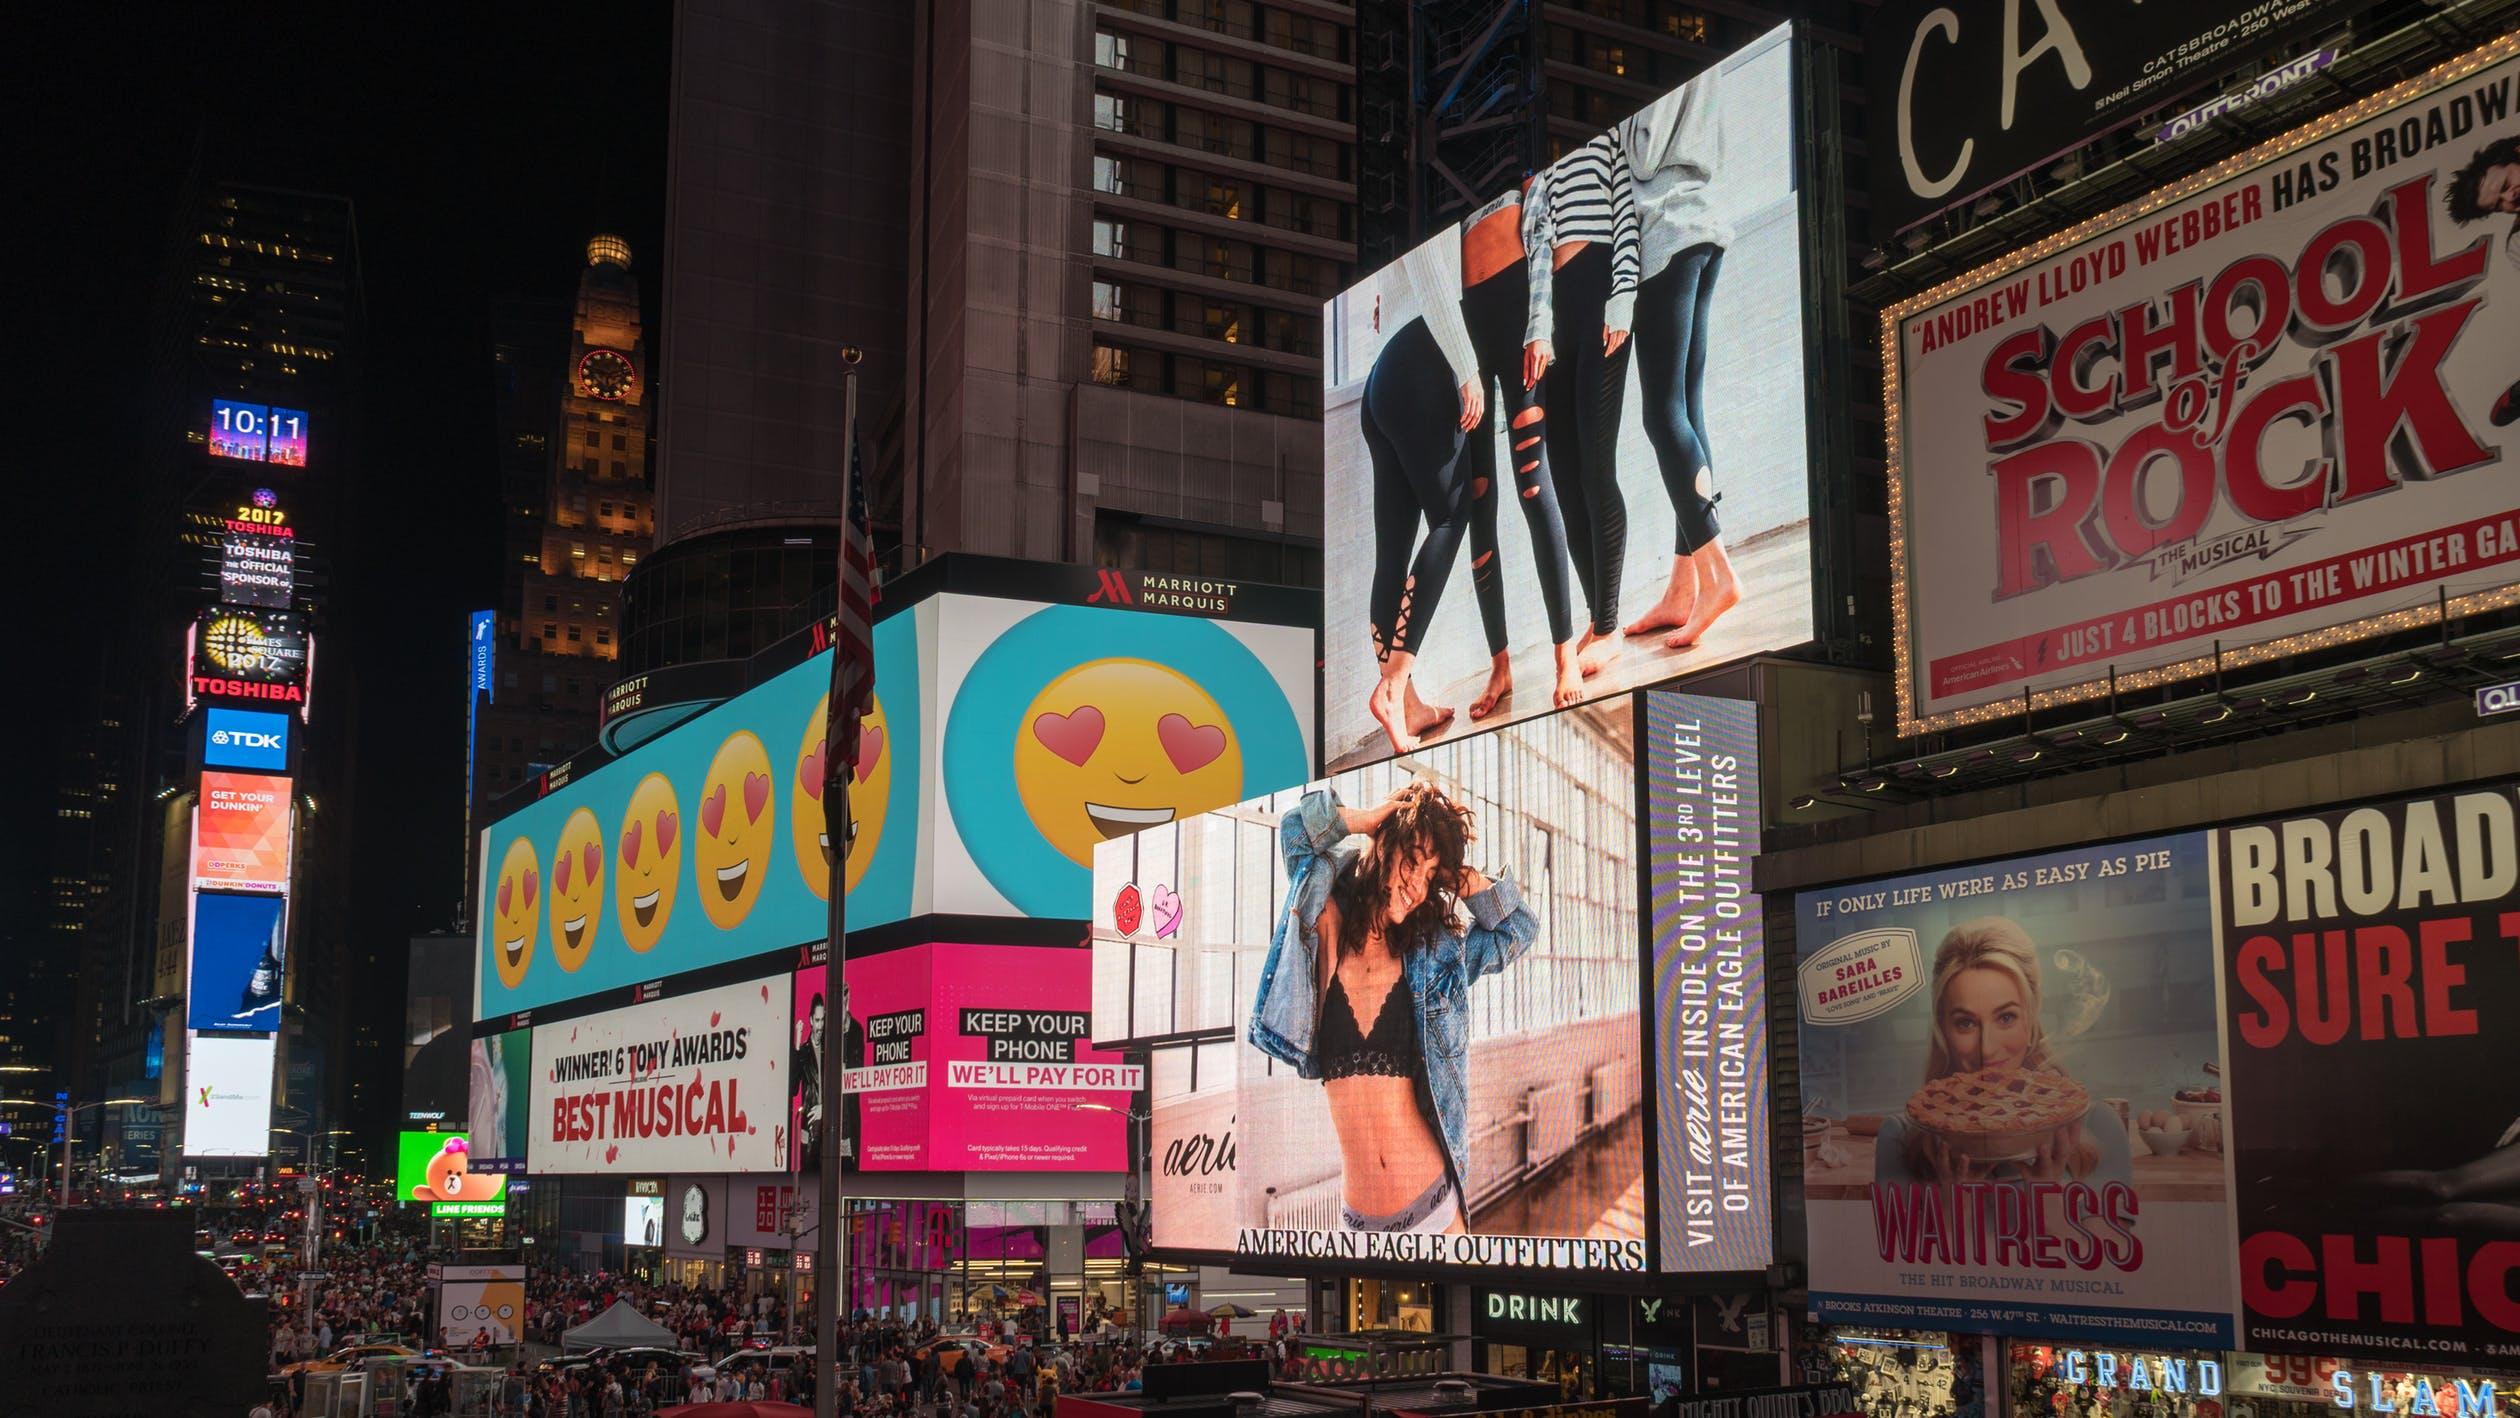 Advertising street